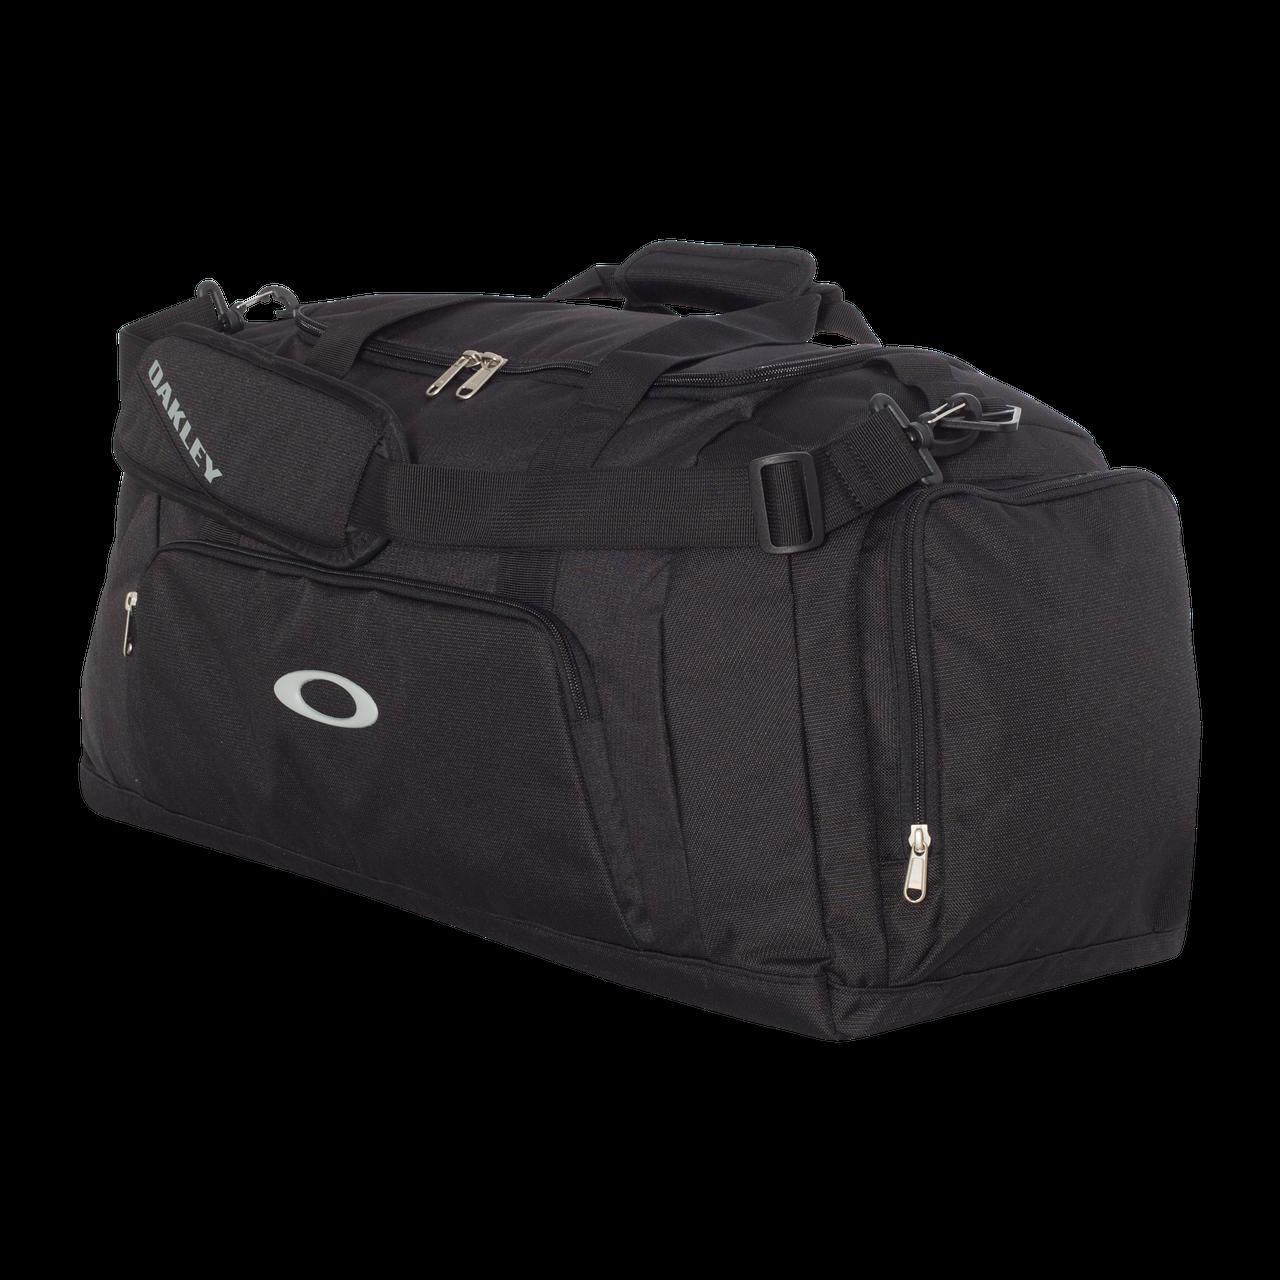 Blackout - 92904ODM Oakley Crestible Gym Duffle Bag | T-shirt.ca